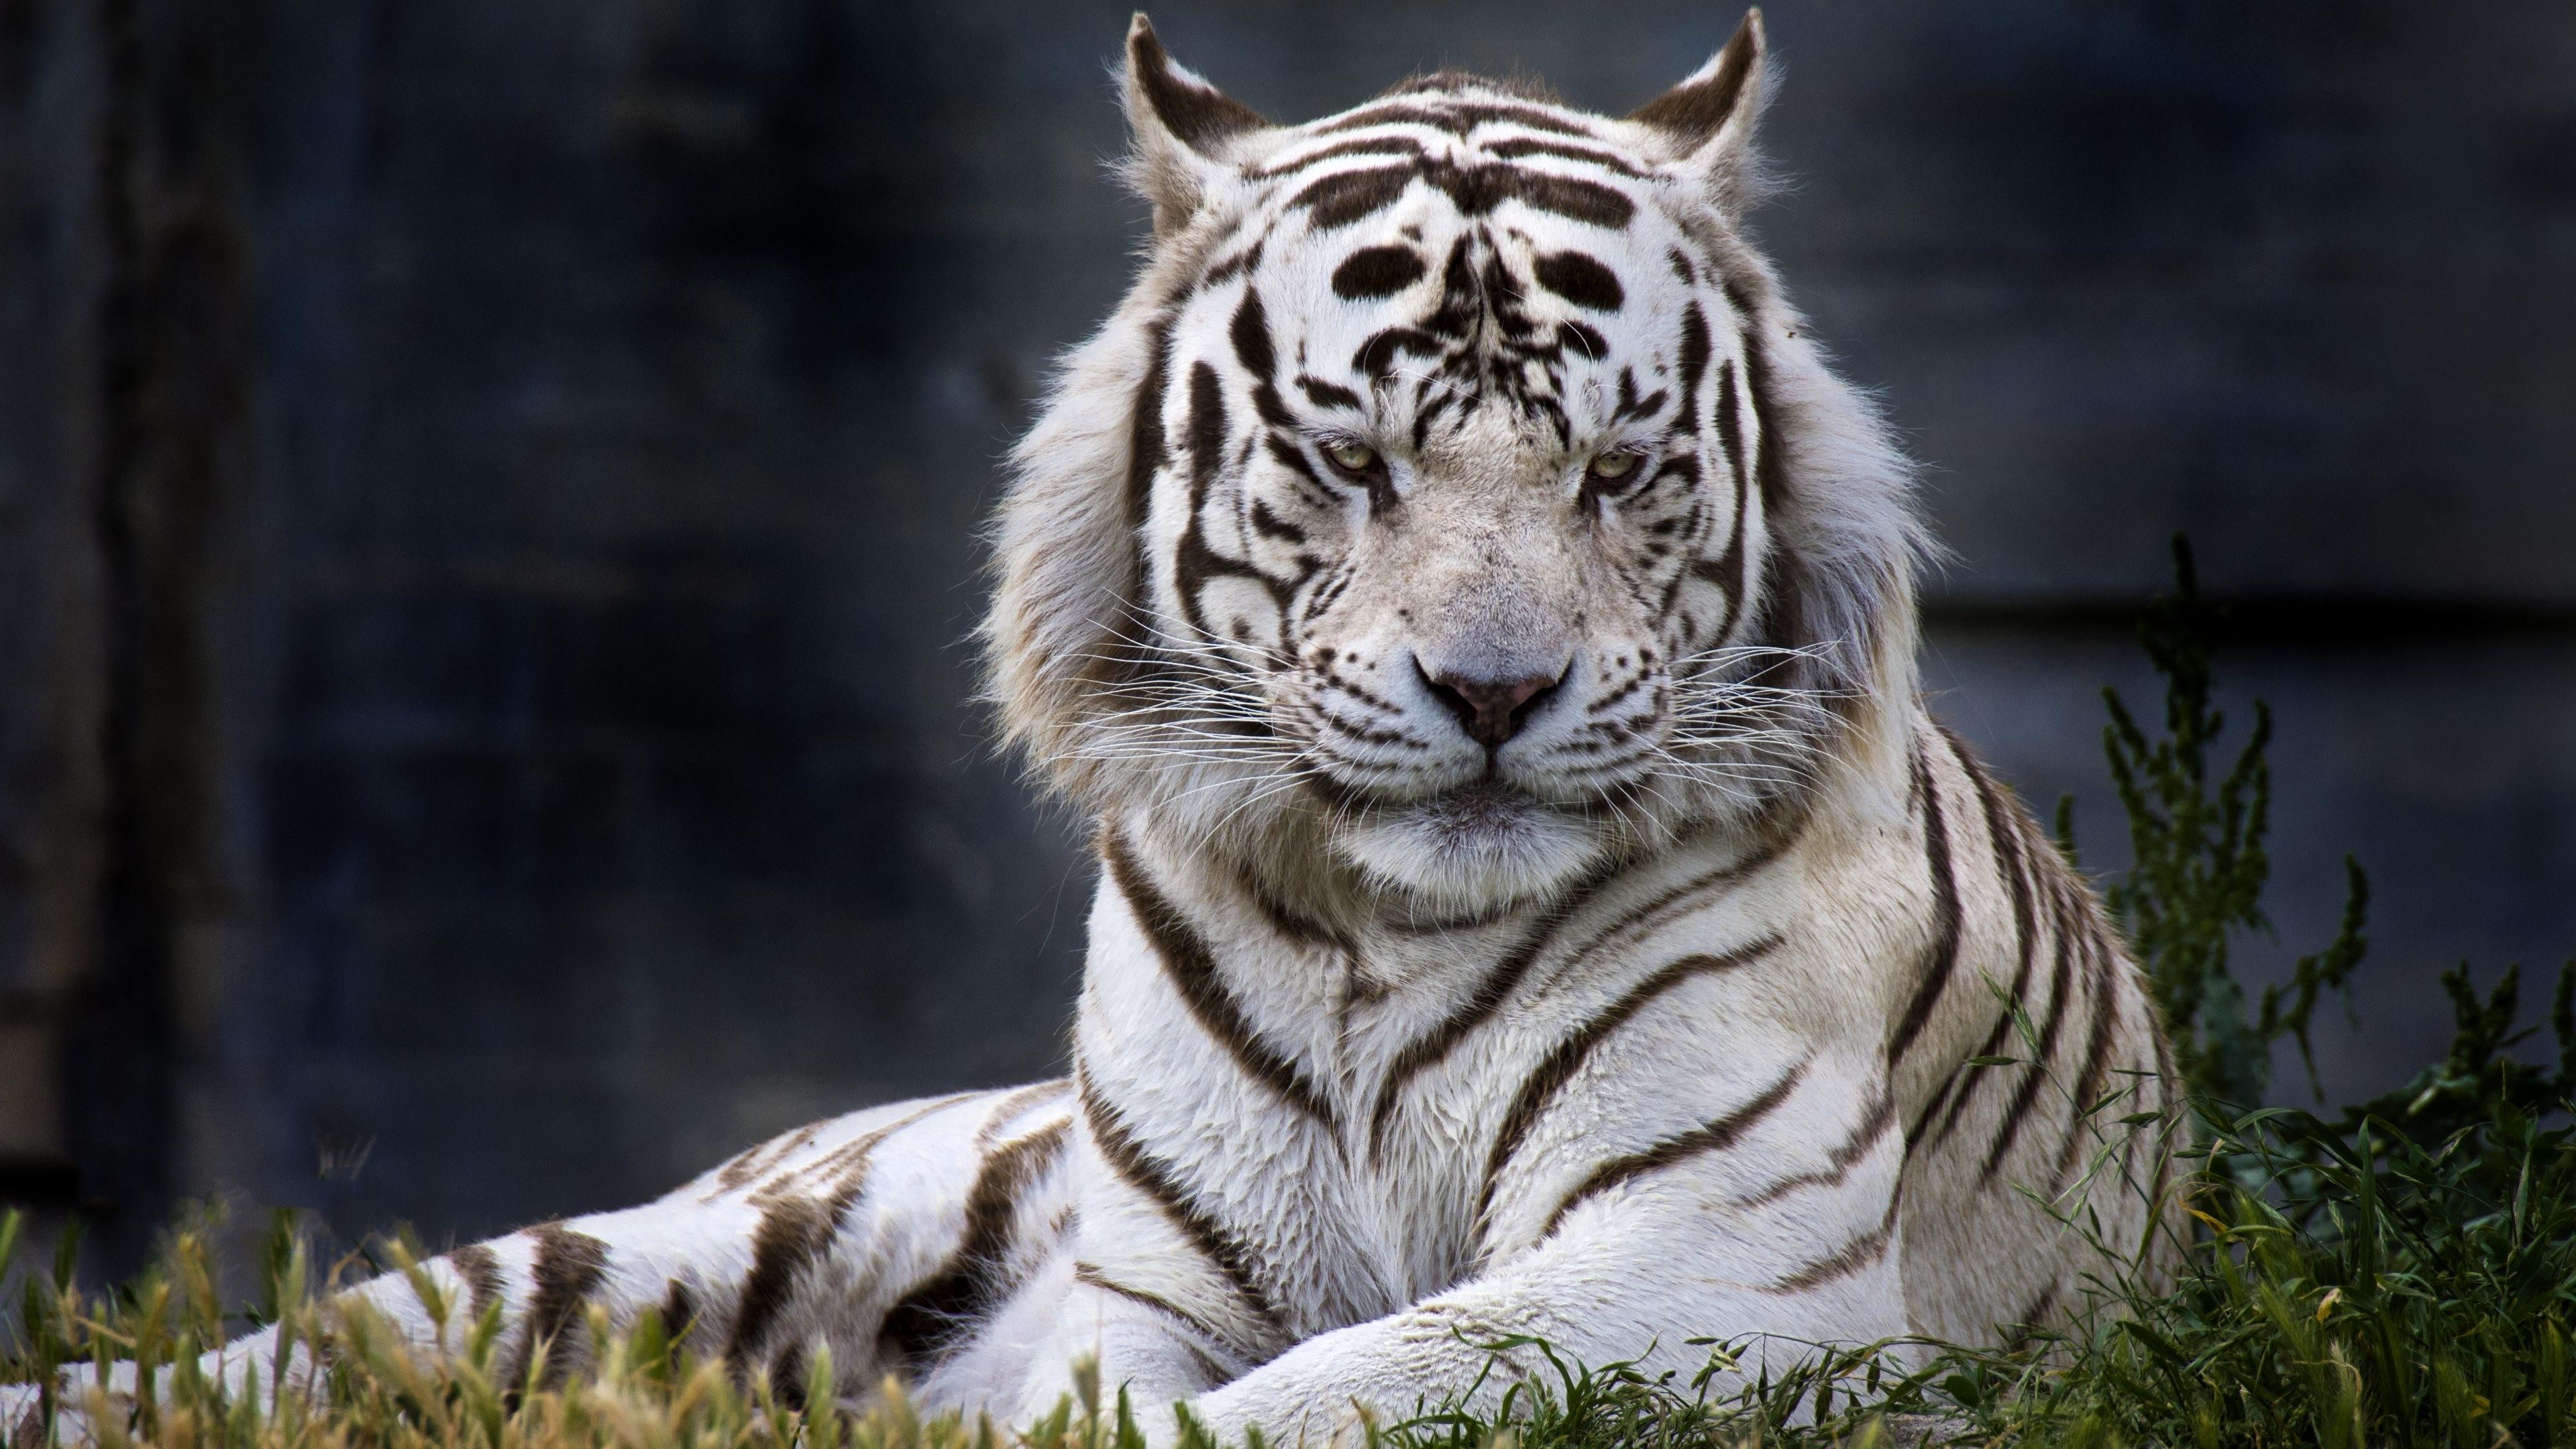 Tiger Wallpaper Desktop 62 Pictures